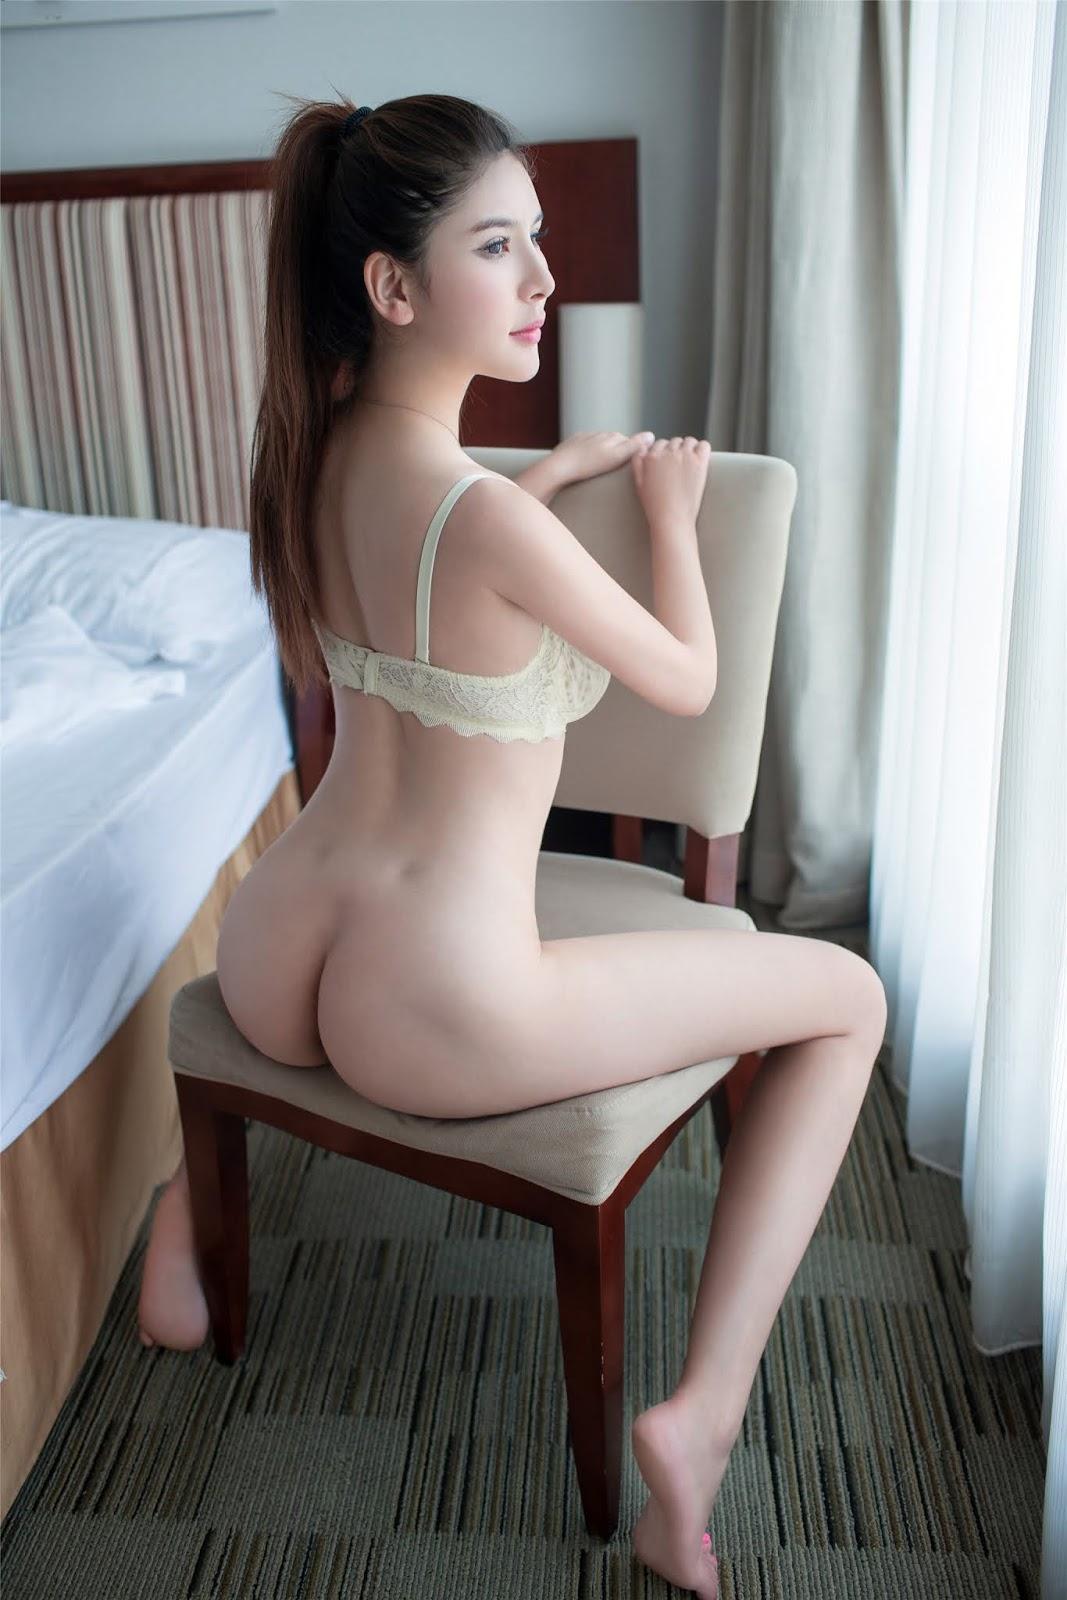 BoolWowGirls%2B%25282%2529 - Li LiSha 李丽莎 Beautiful Nude Model